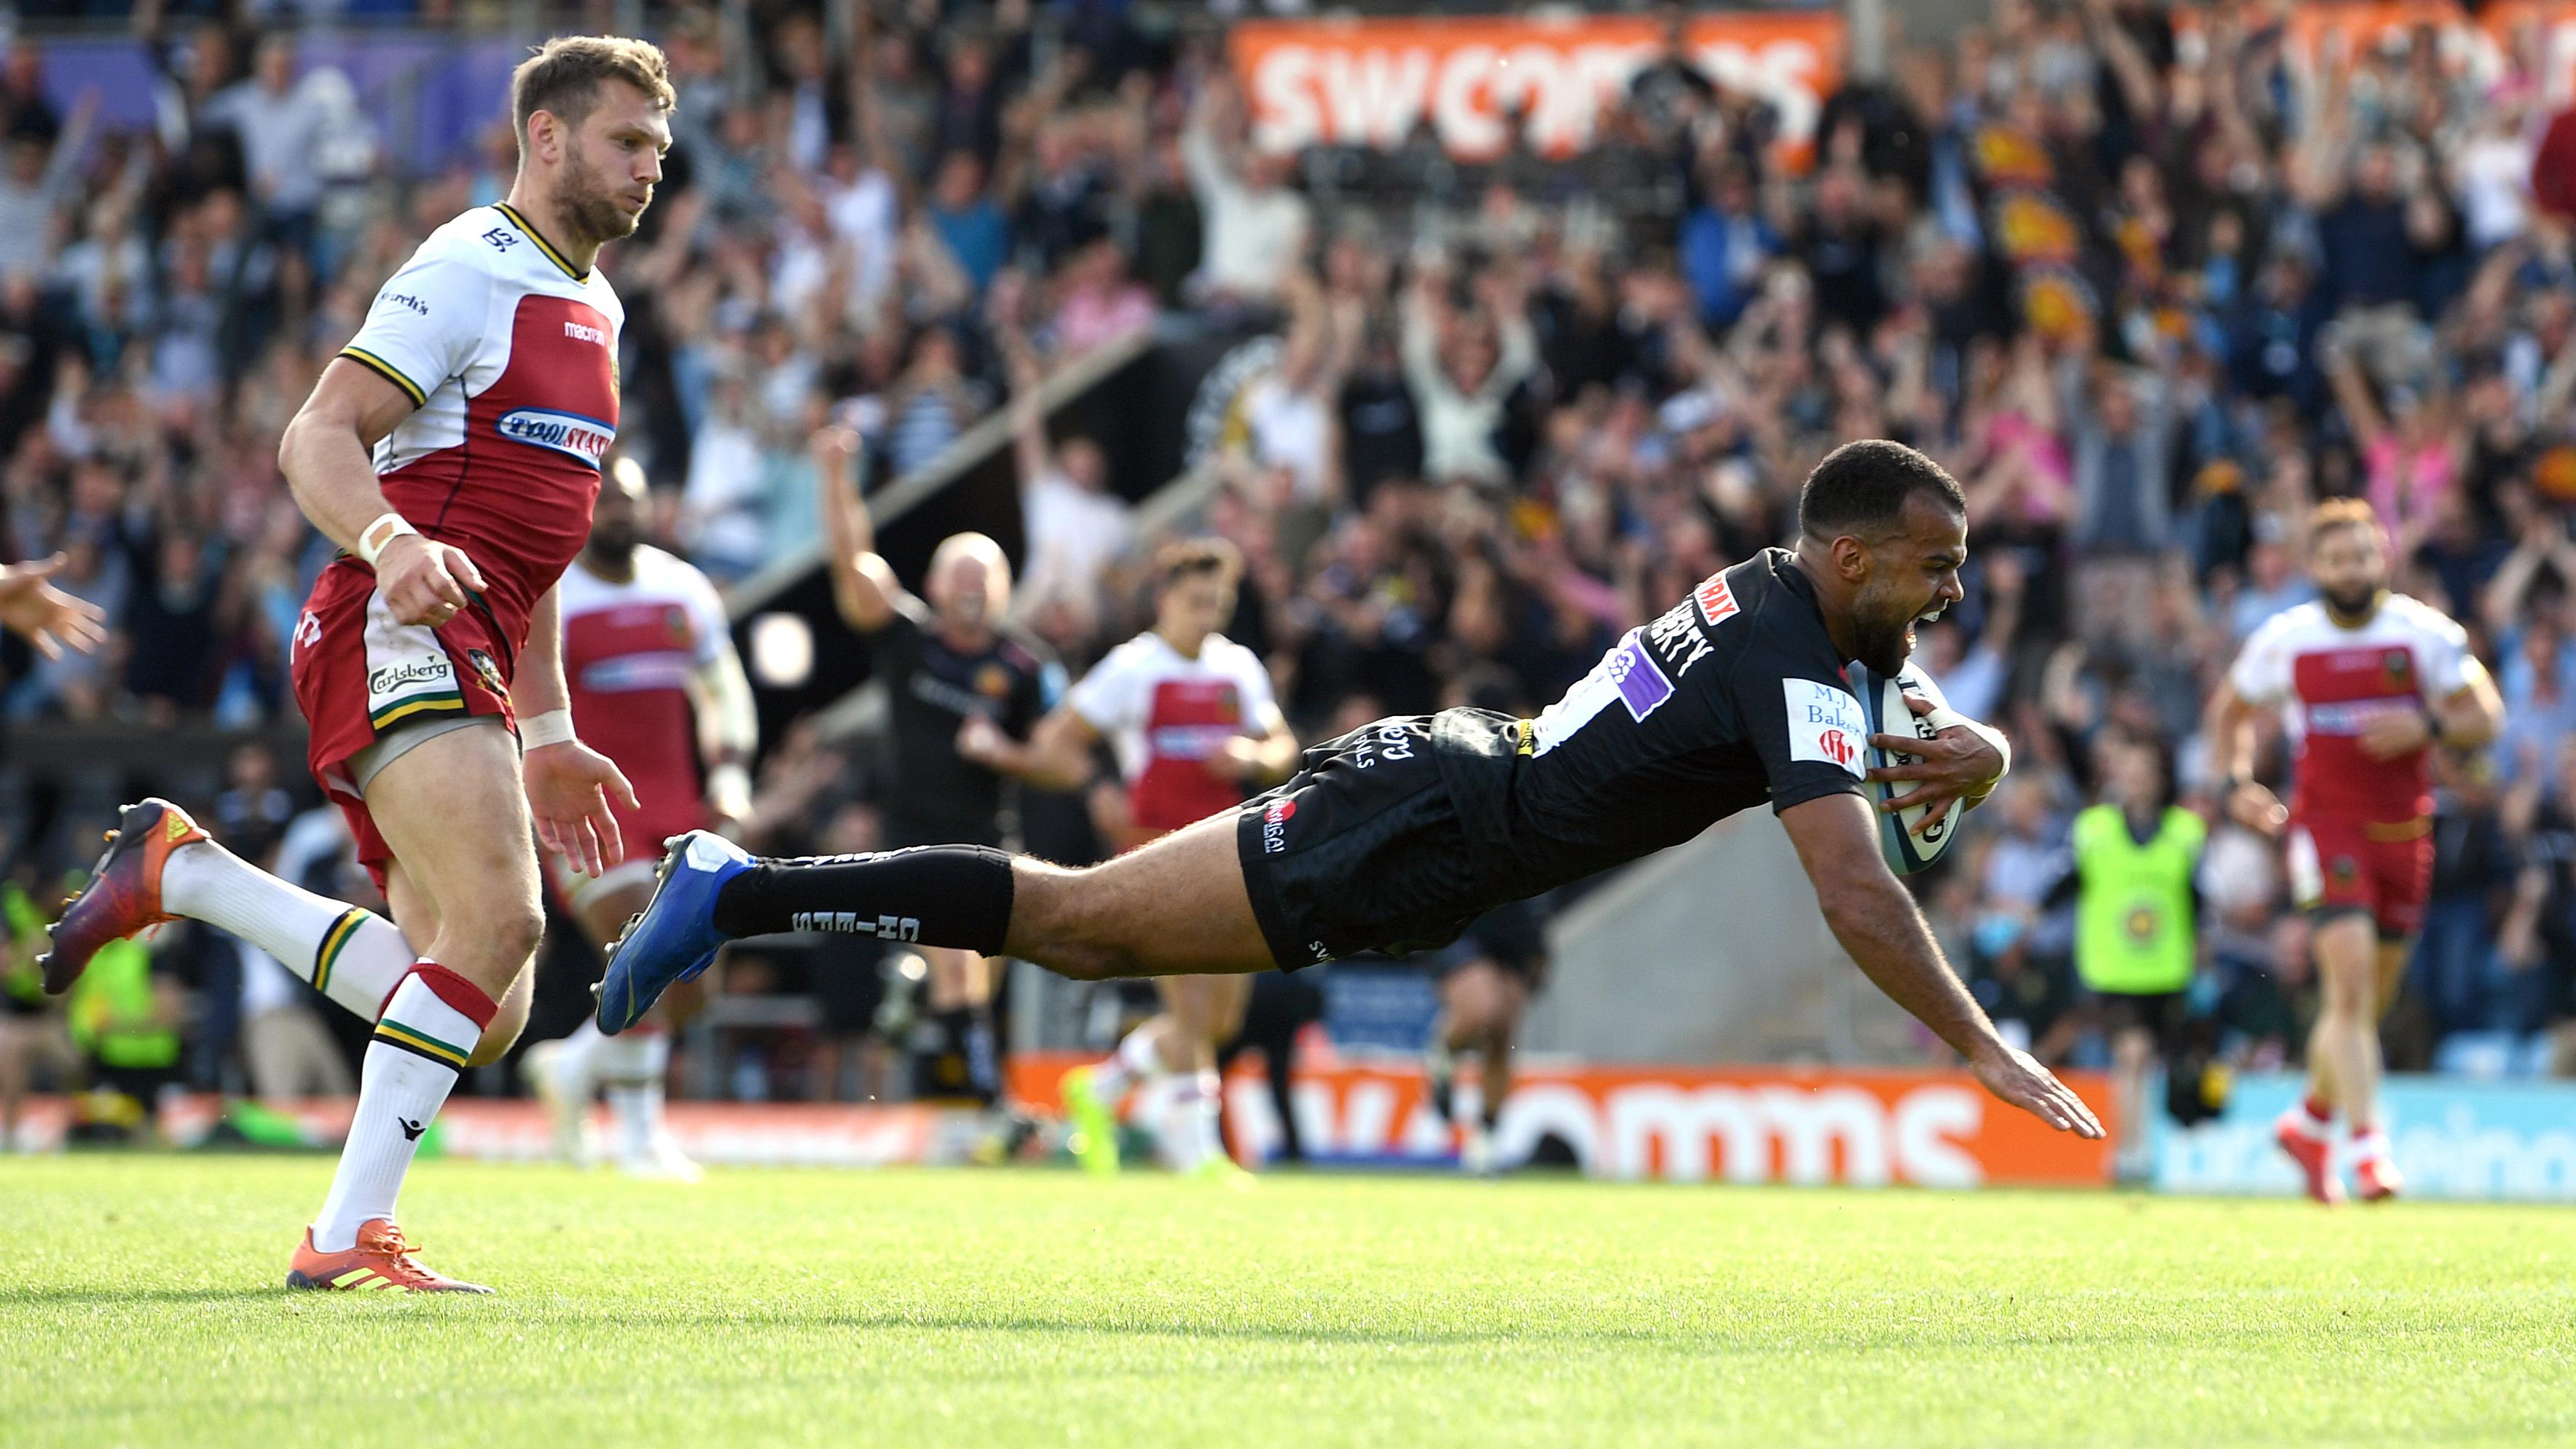 Premiership Rugby Semifinals: Saracens-Gloucester; Exeter-Northampton